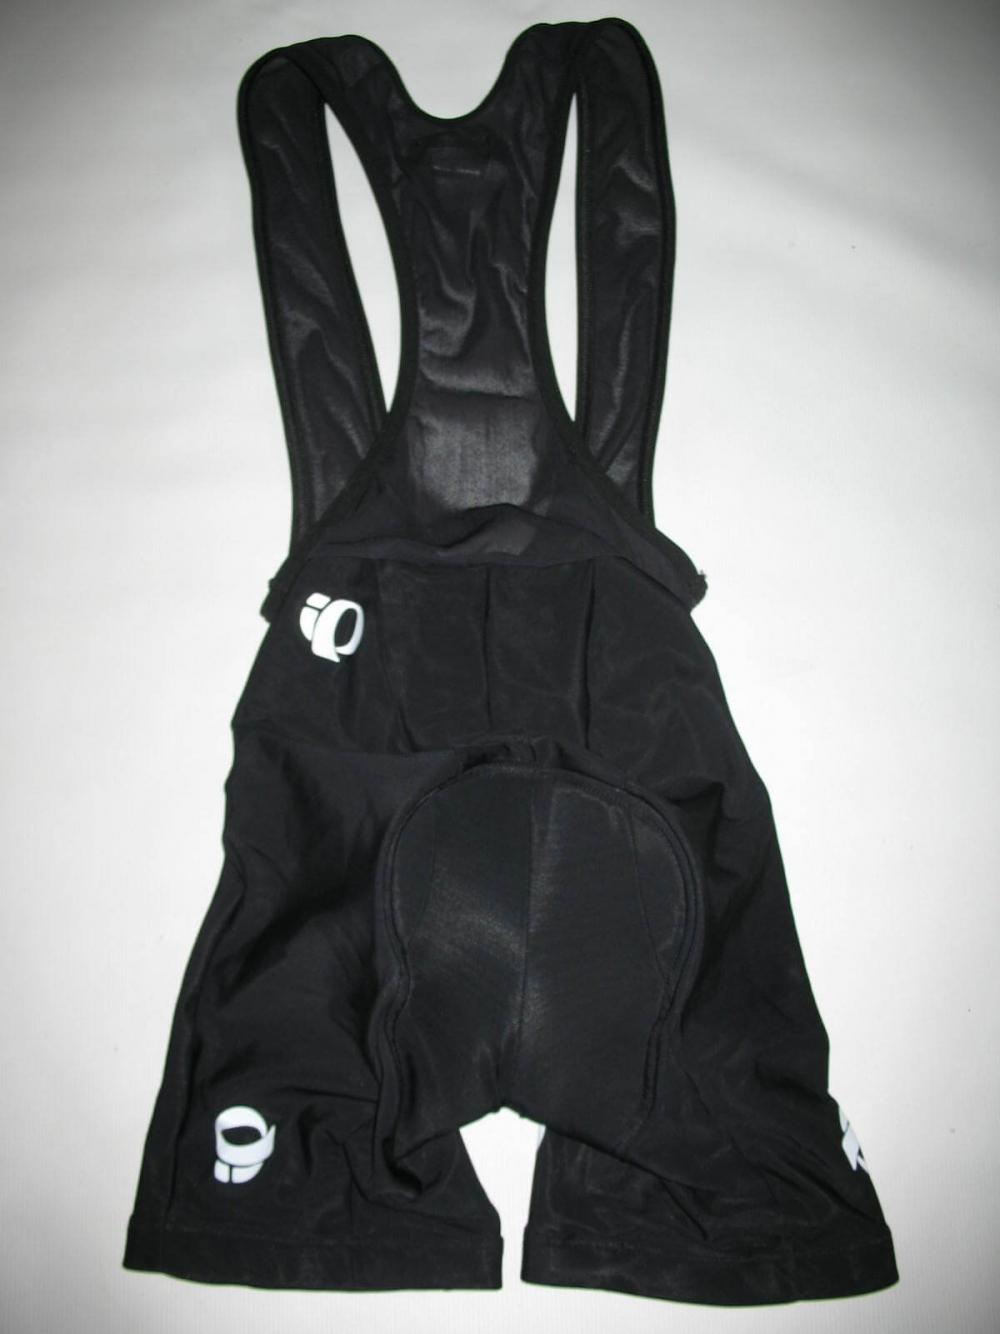 Велошорты PEARL IZUMI bib shorts (размер М/S) - 3